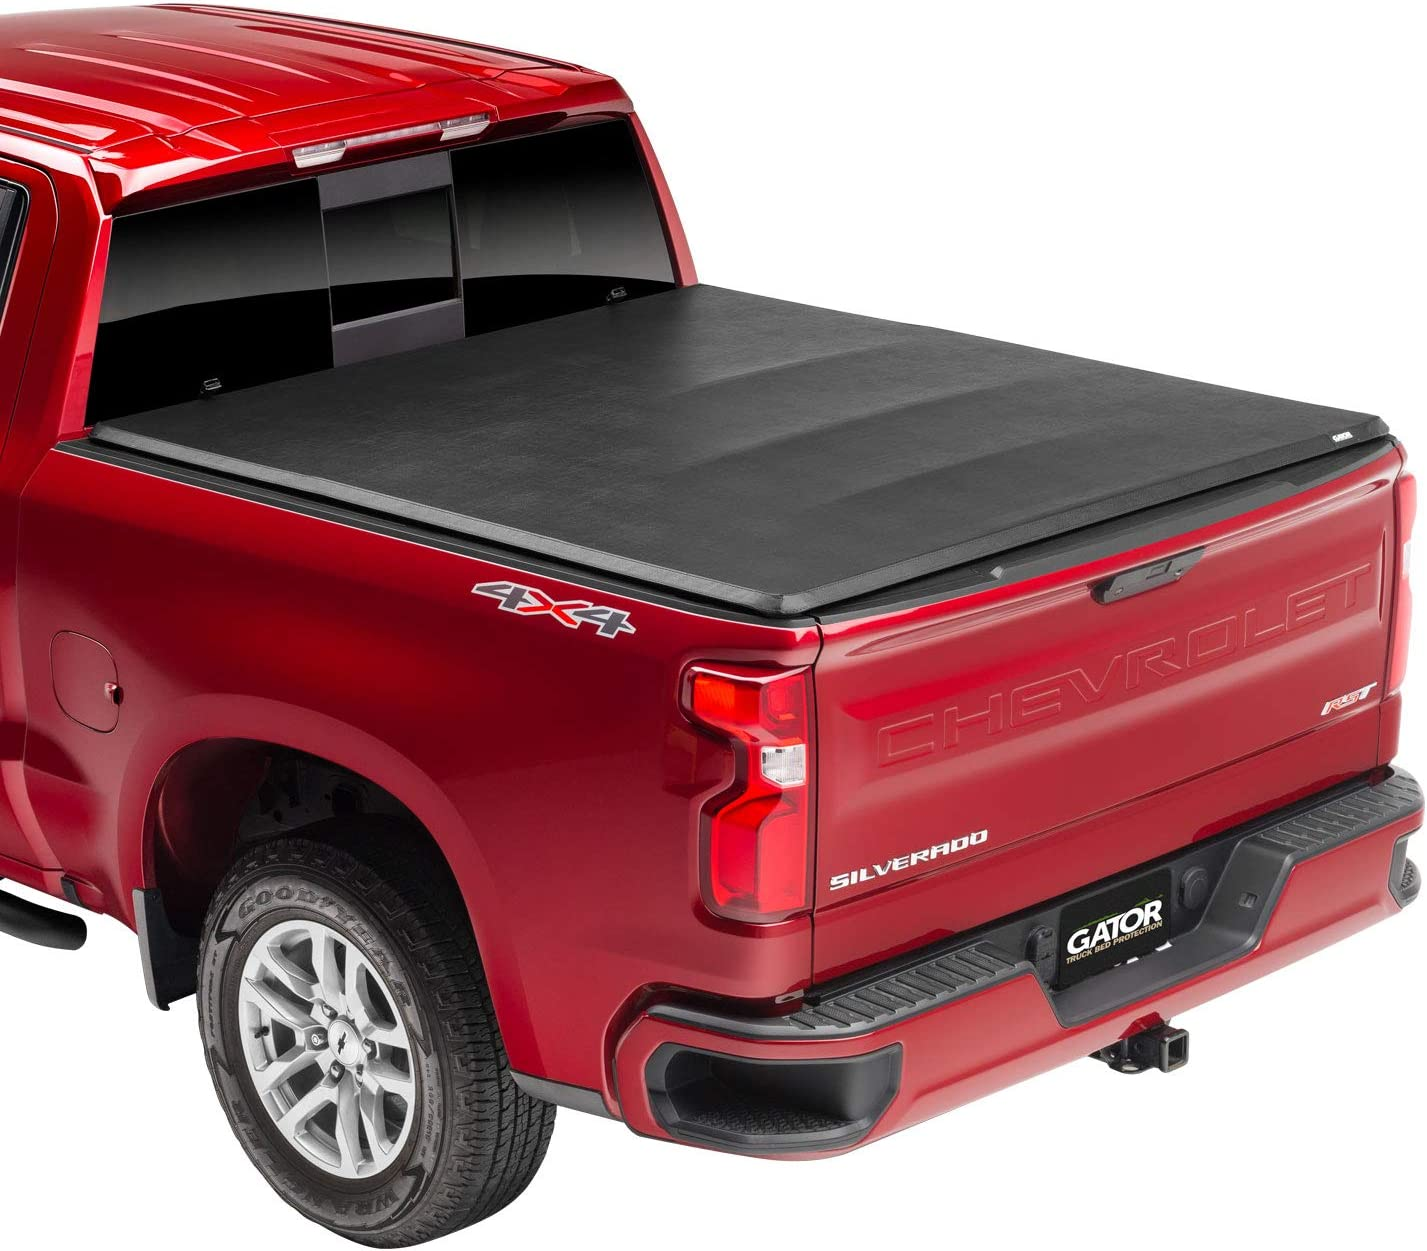 Amazon Com Gator Etx Soft Tri Fold Truck Bed Tonneau Cover 59110 Fits 2014 2018 2019 Ltd Lgcy Chevy Gmc Silverado Sierra 1500 6 6 Bed Made In The Usa Automotive